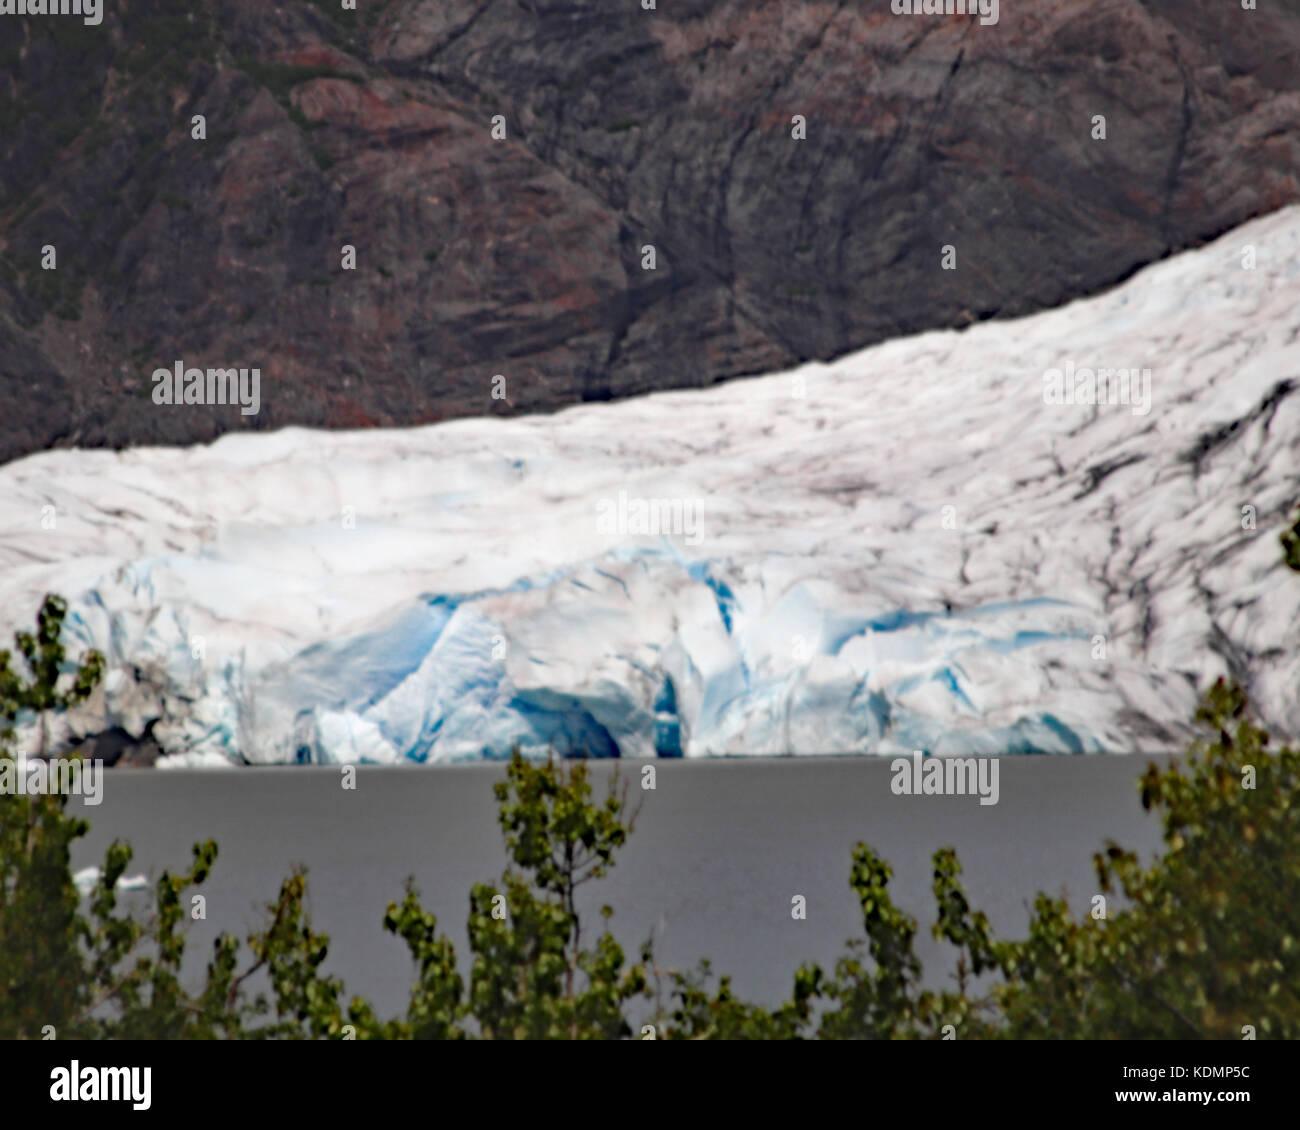 Closeup of Mendenhall glacier ice as it touches into Mendenhall lake in Juneau, Alaska Stock Photo